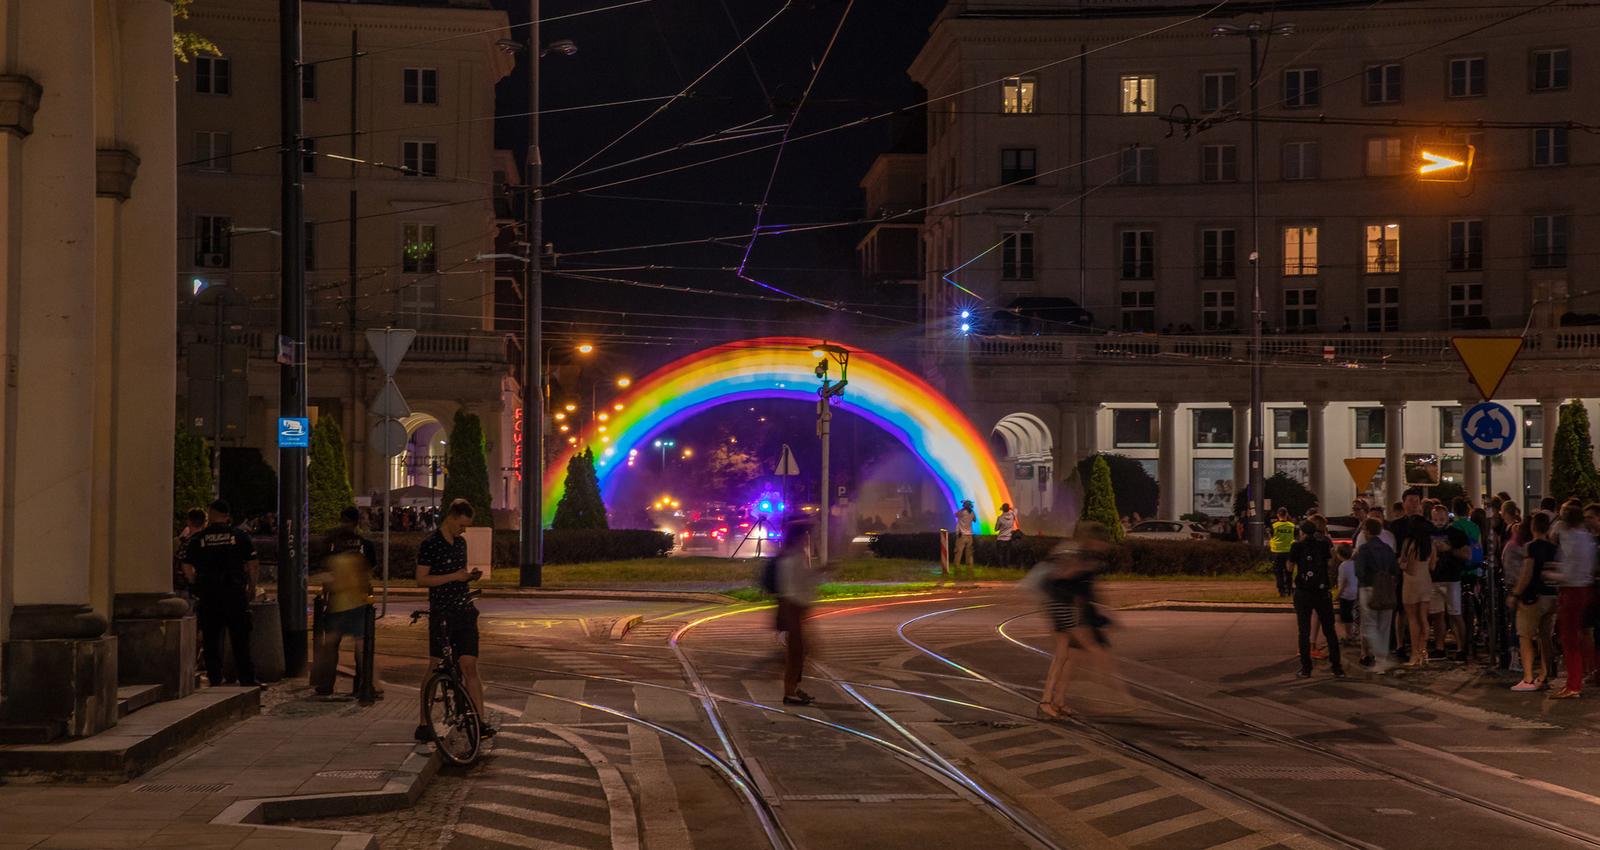 The Unbreakable Rainbow